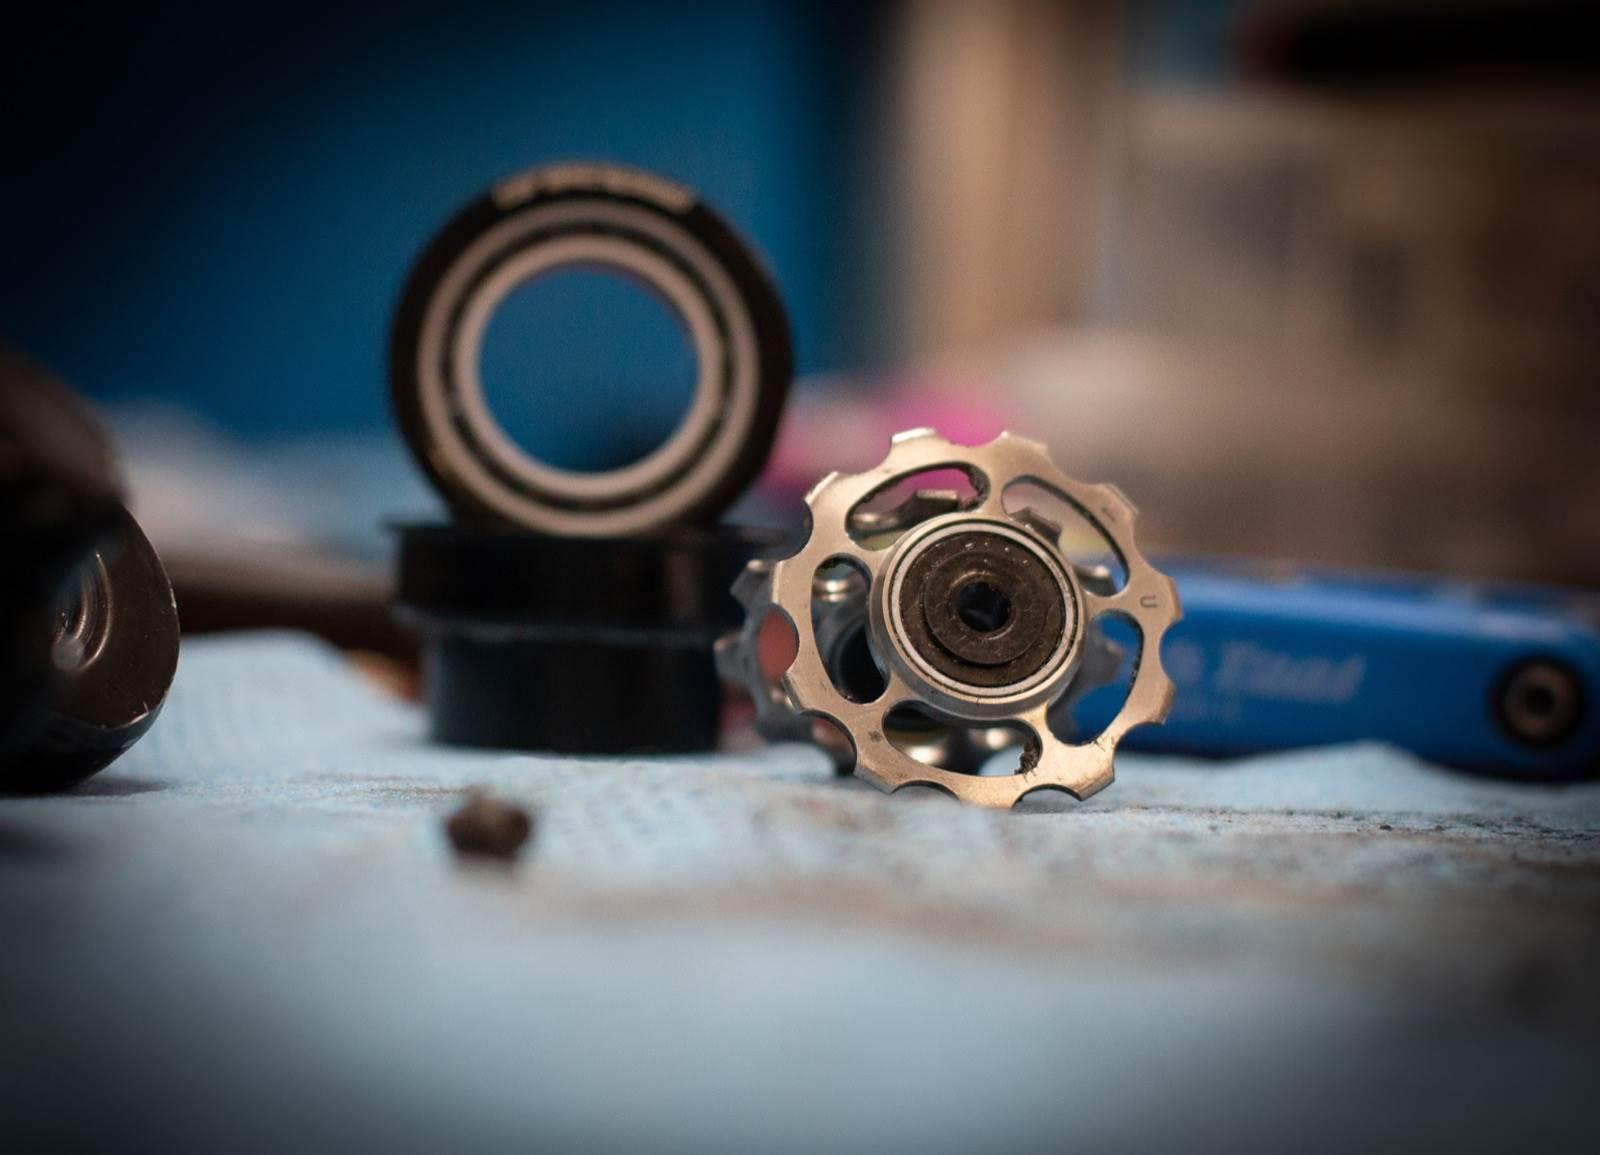 TESTED: Ceramic Speed Coated Bearings